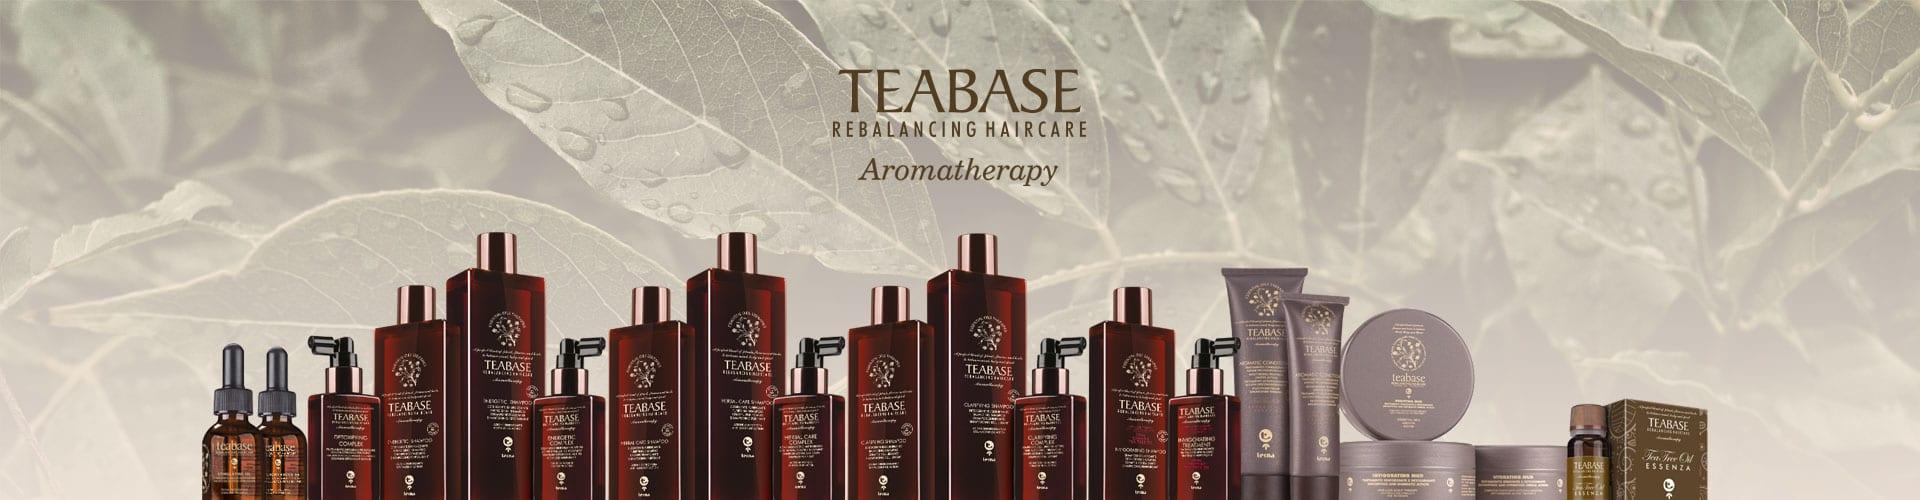 linea Teabase di Tecna a base di Tea Tree Oil